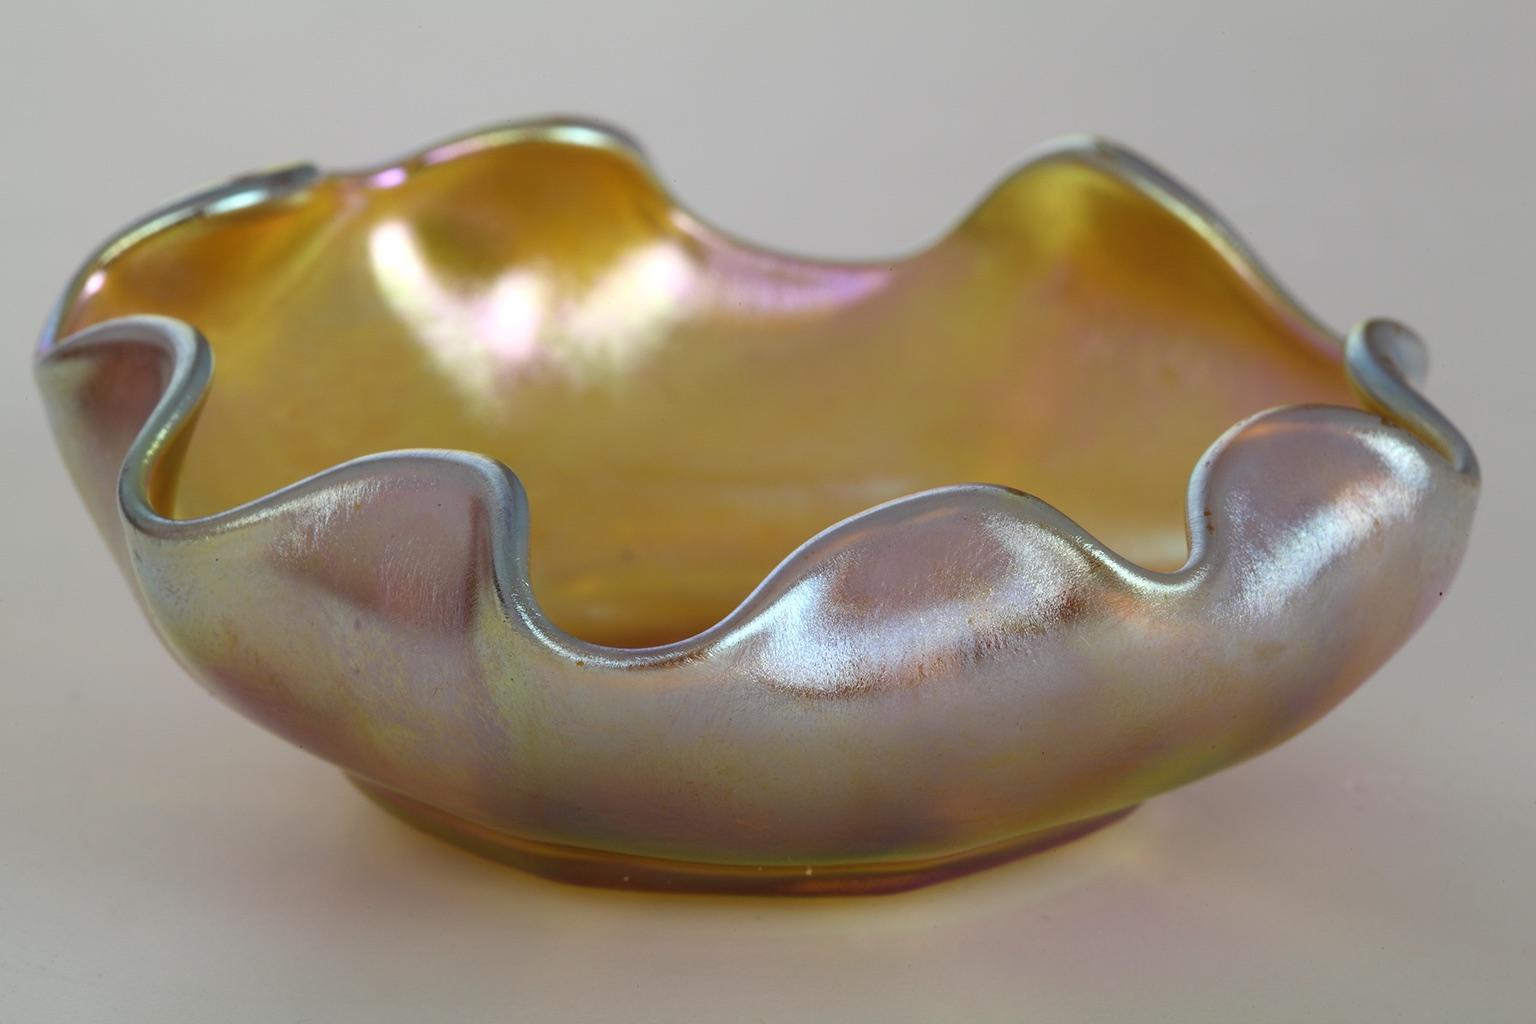 Solniczka szklana Louisa Comforta Tiffany'ego, Nowy